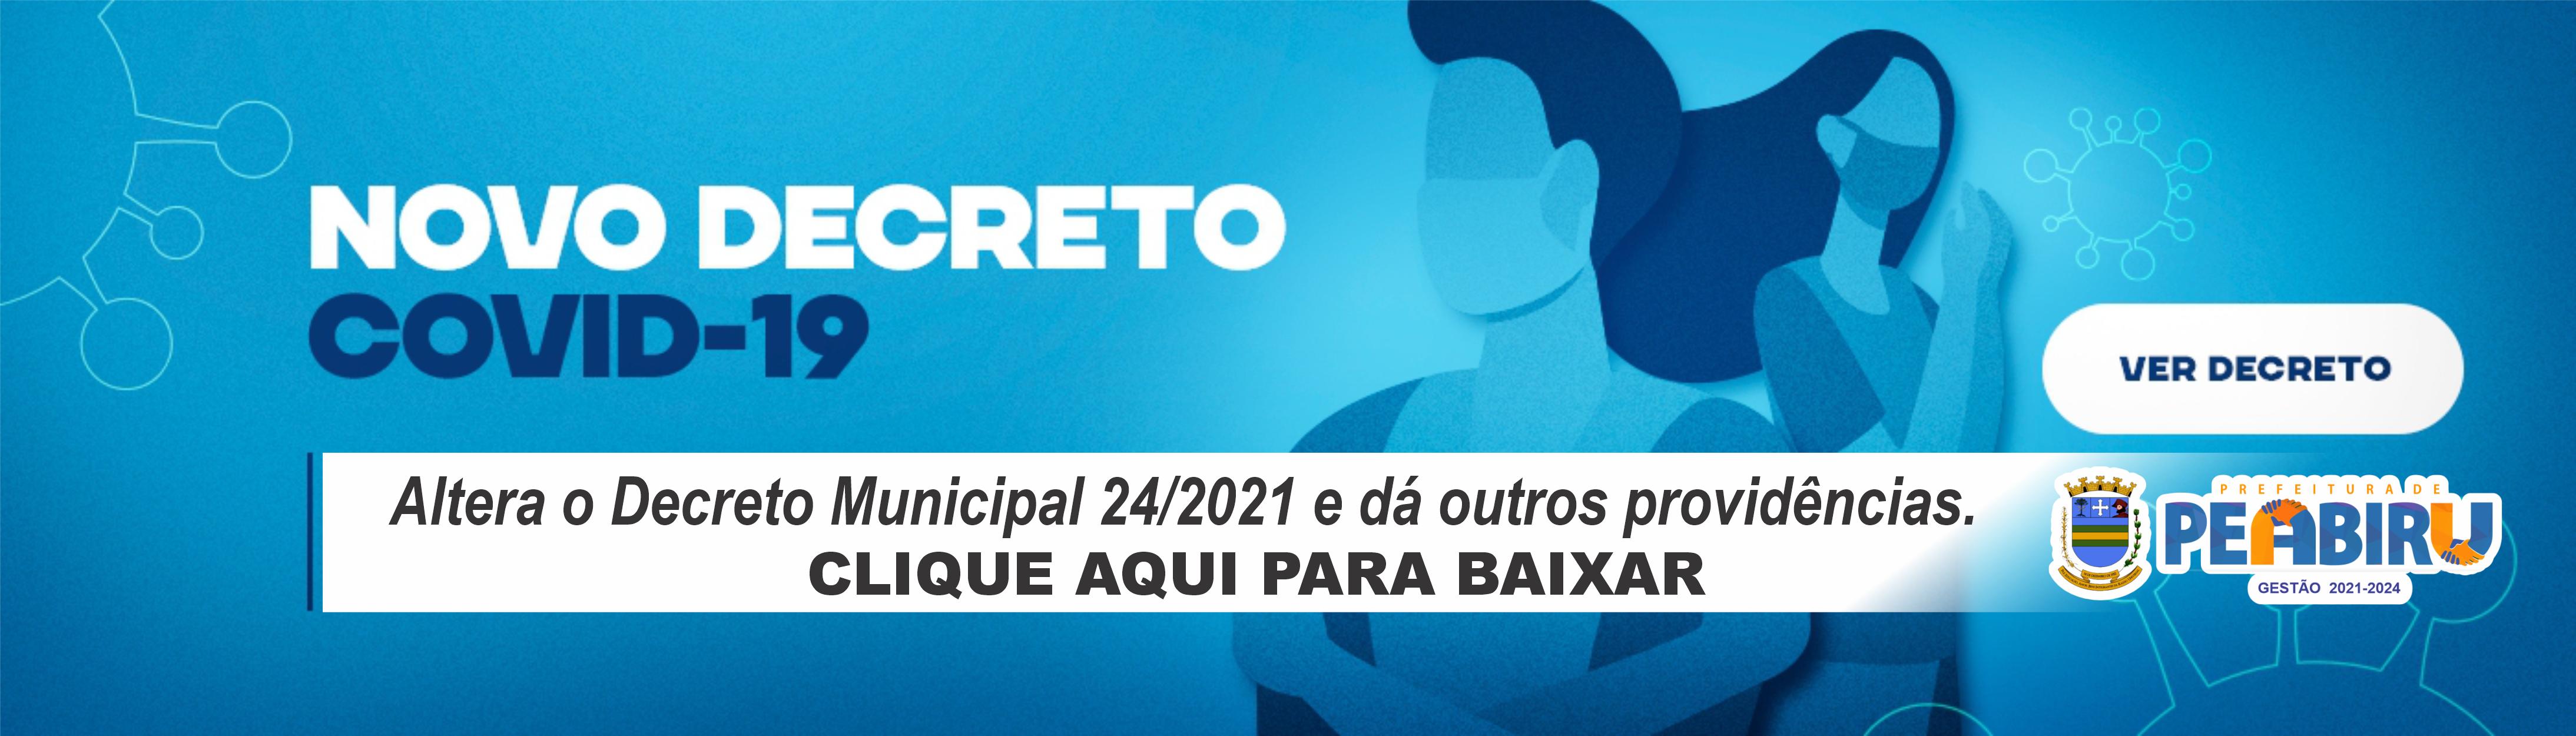 DECRETO 61 DE 31 DE MAIO DE 2021